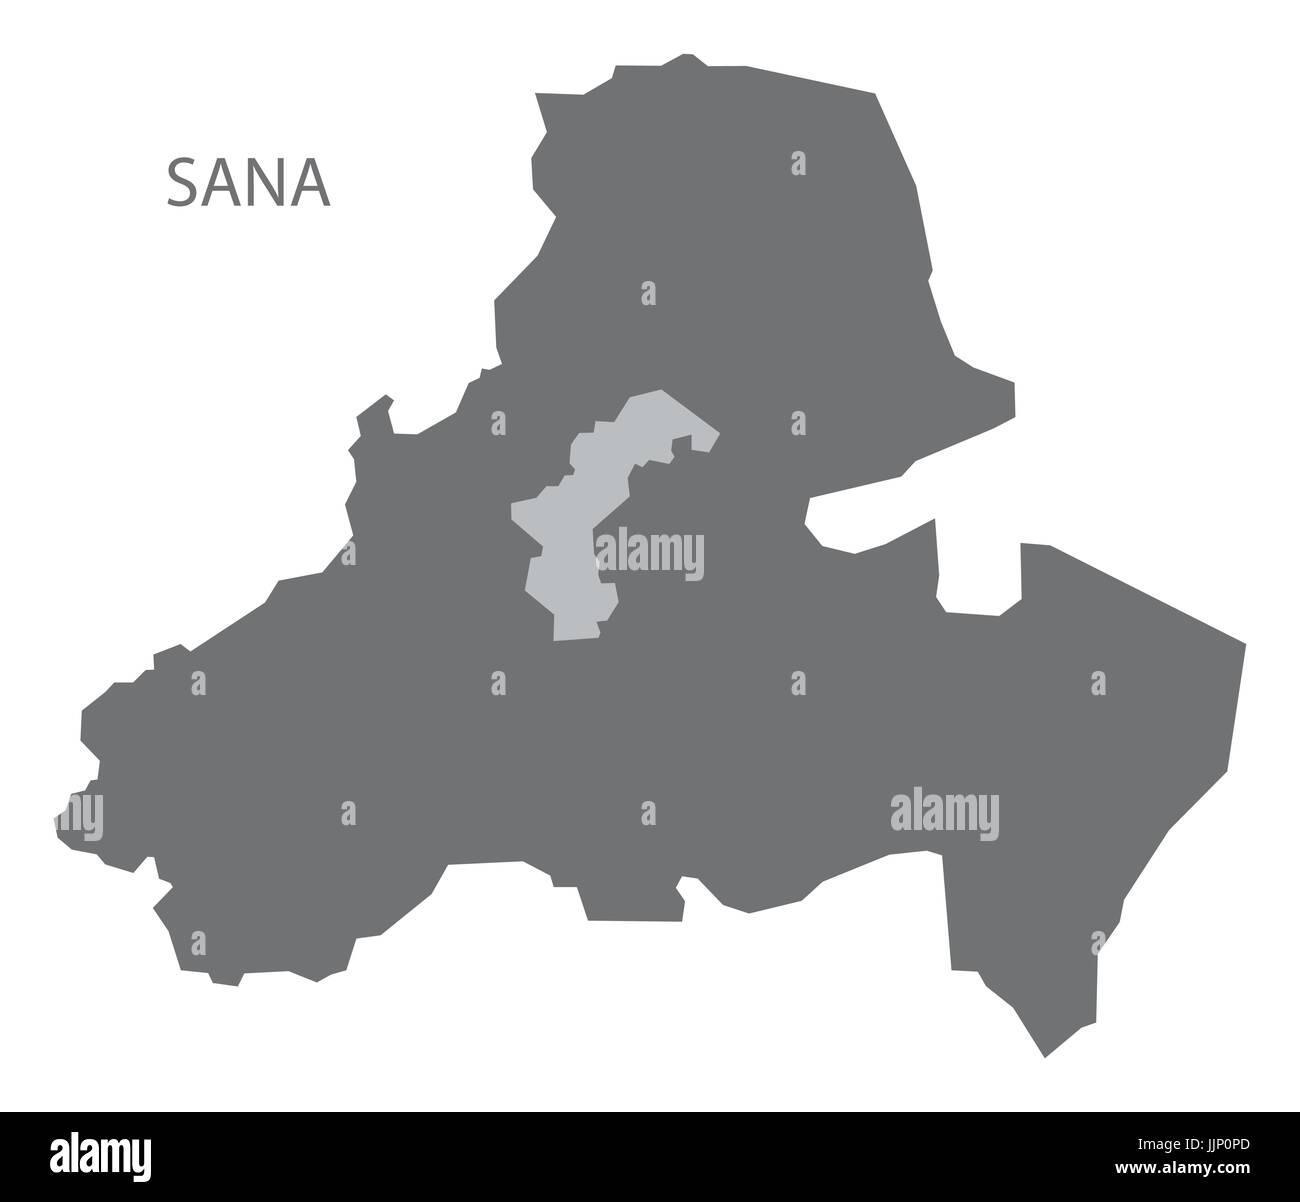 Sana Yemen governorate map grey illustration silhouette shape - Stock Vector